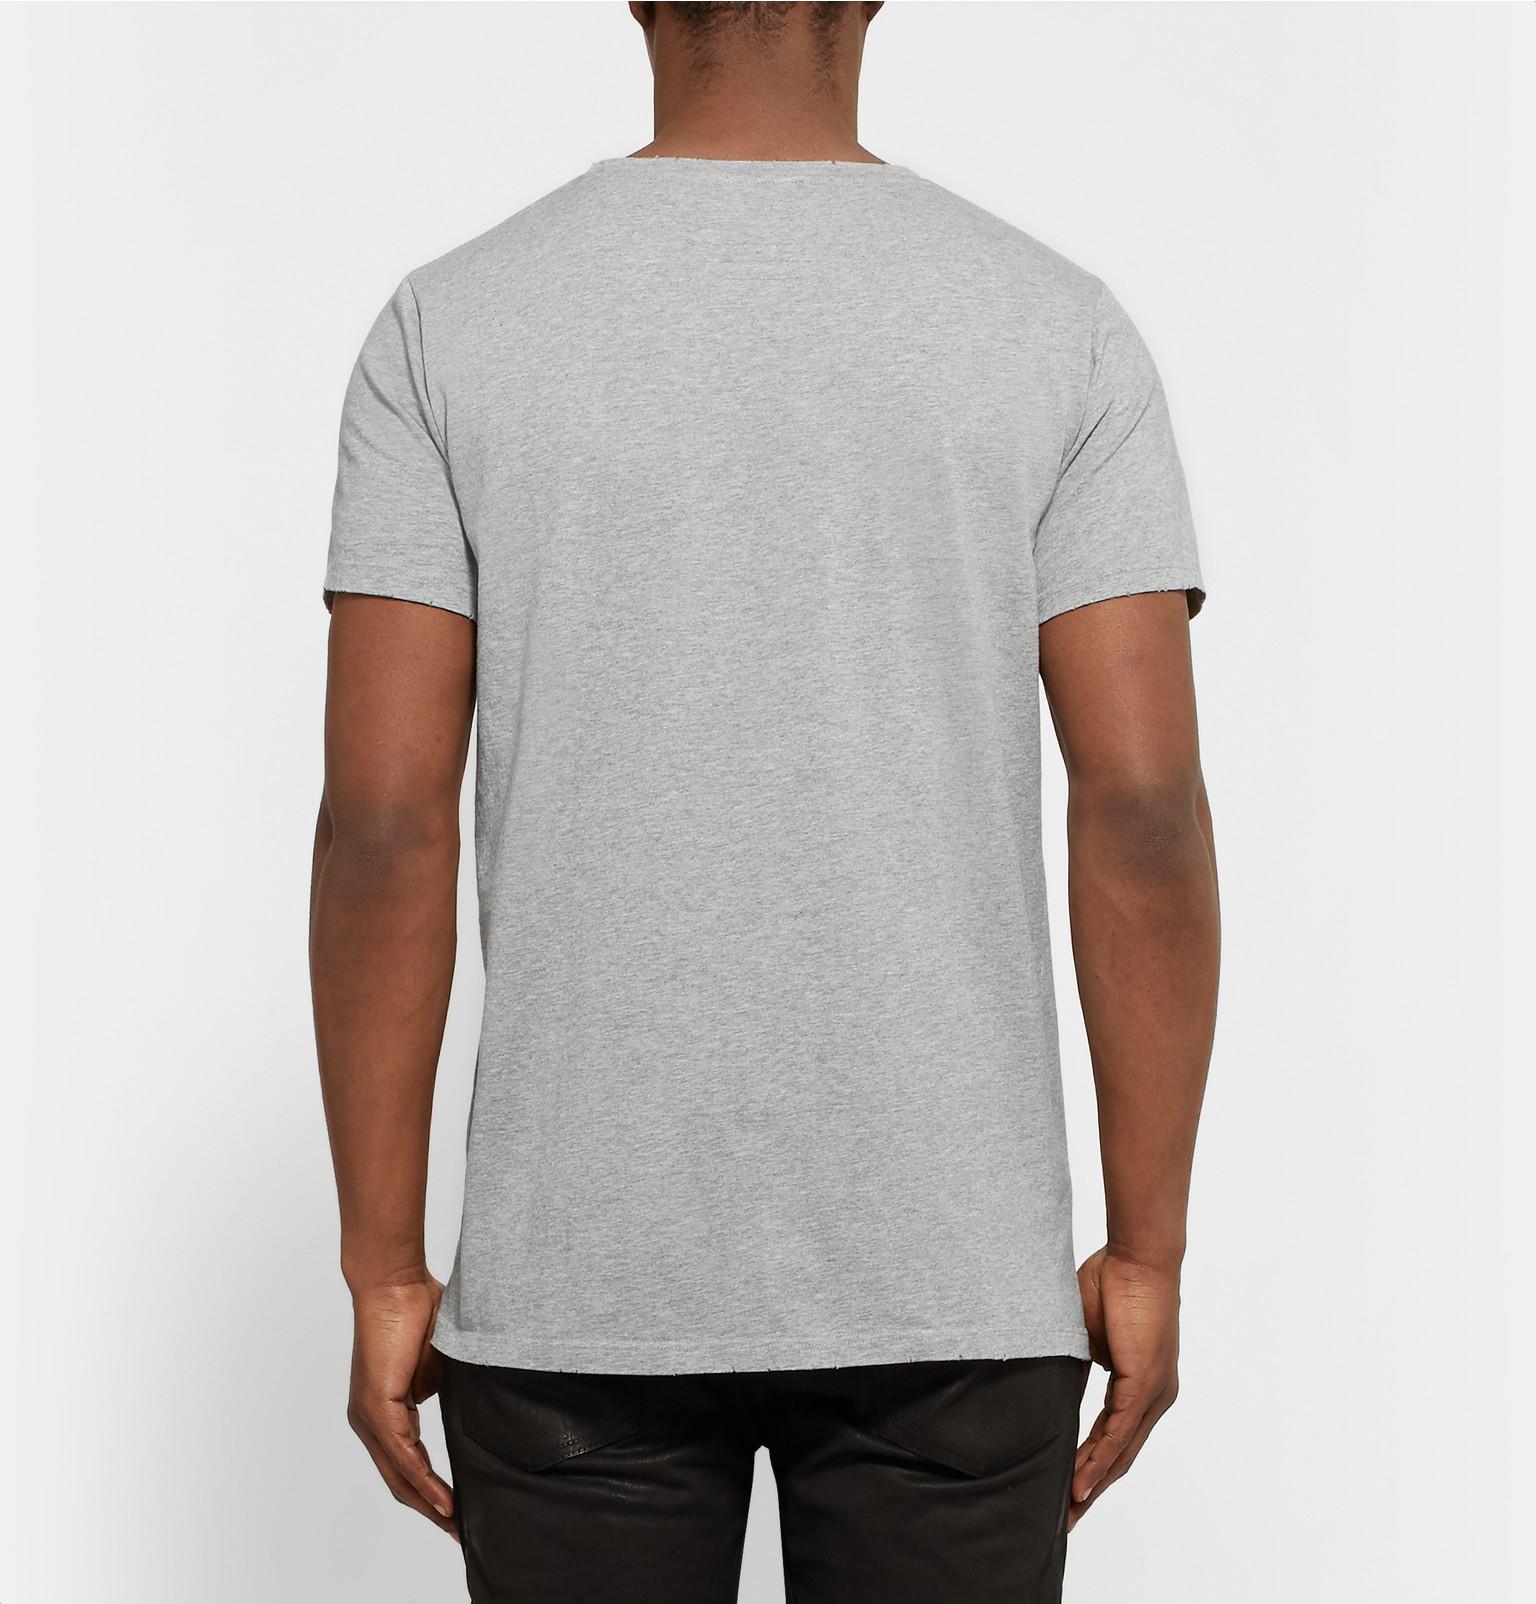 869d86d0f37 Balmain Three-pack Slim-fit Distressed Cotton-jersey T-shirts in ...